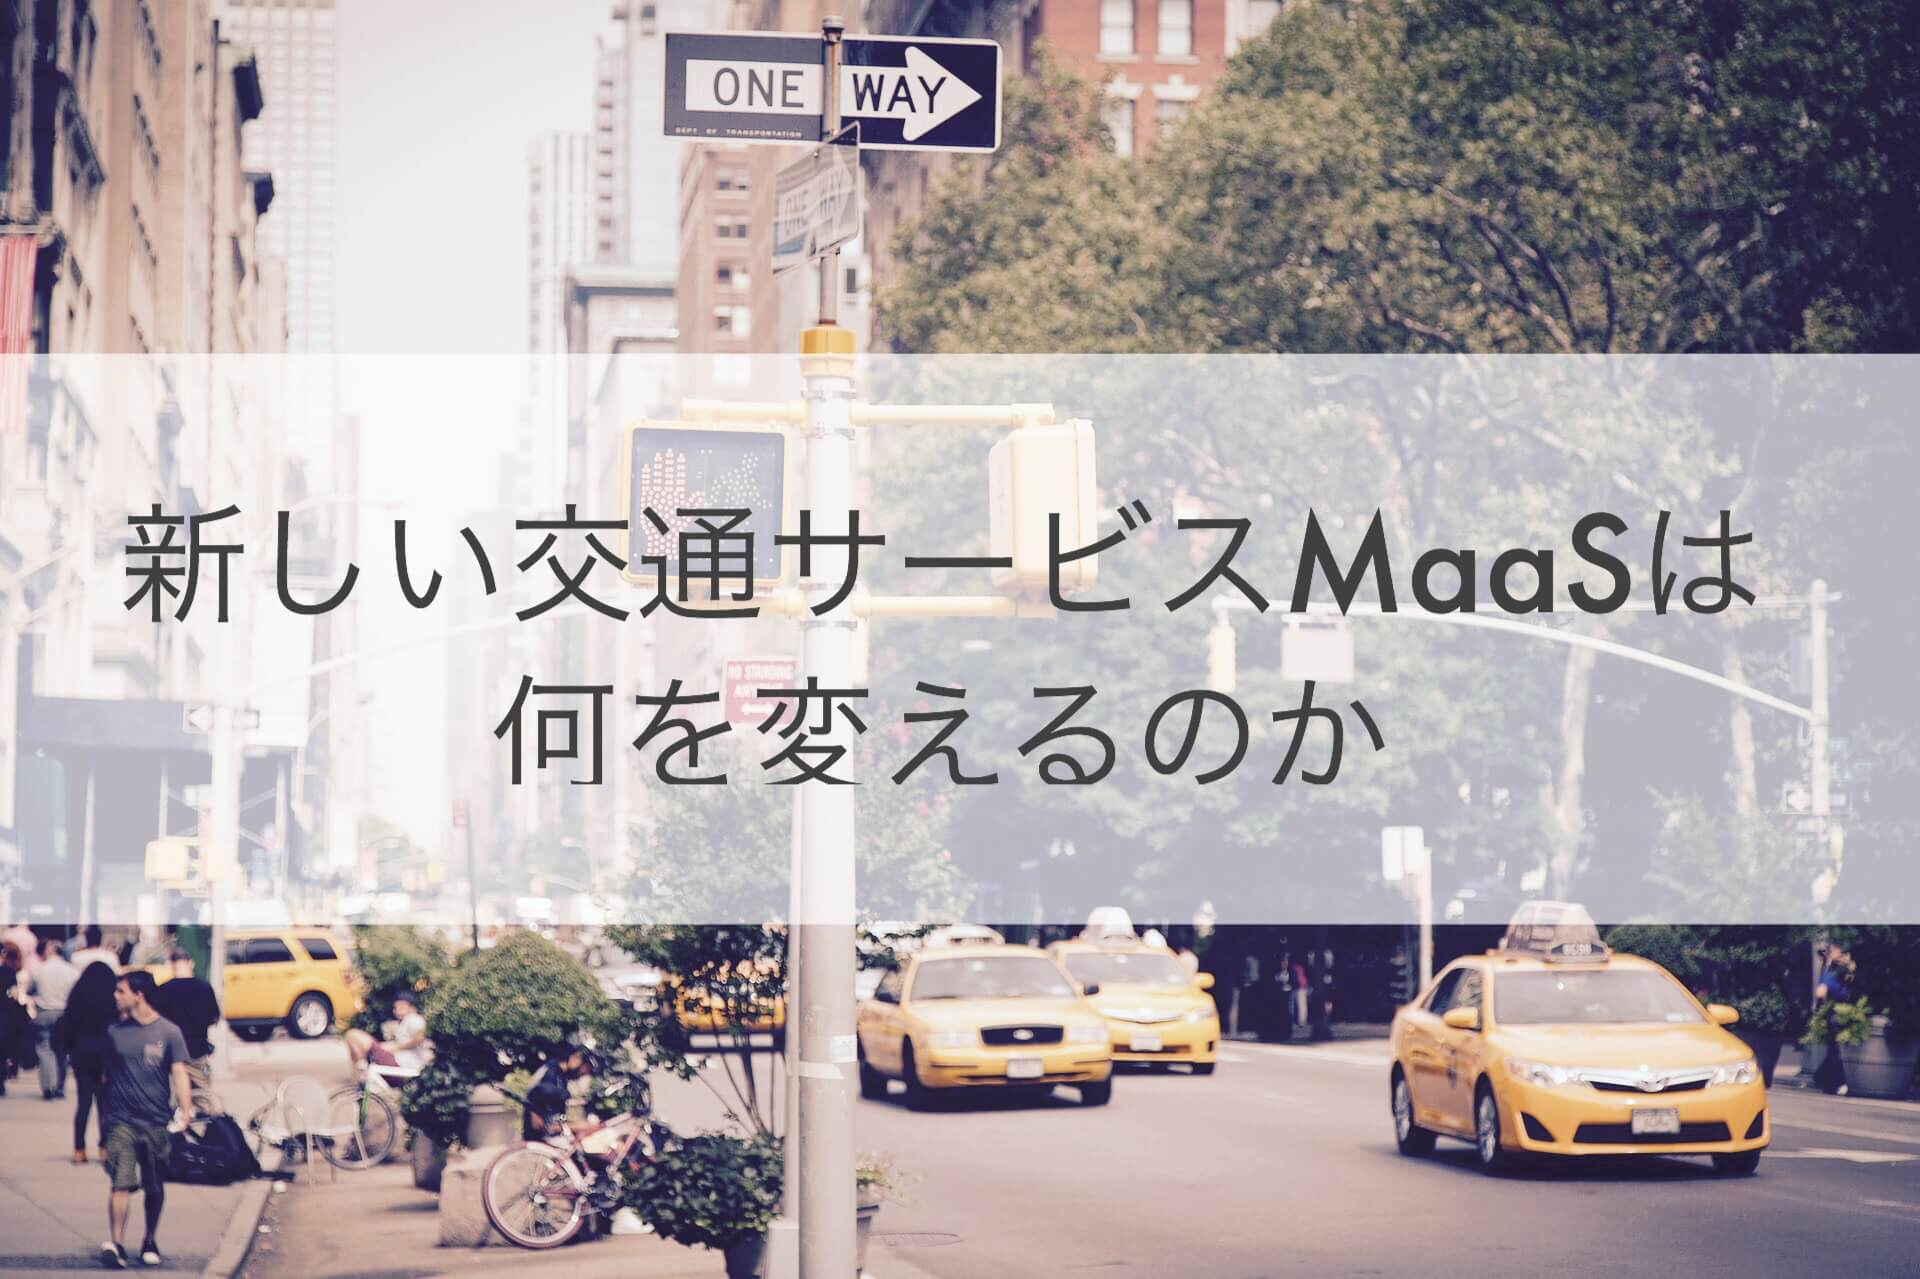 MaaSが都市と地方の交通事情を激変させるかもしれない